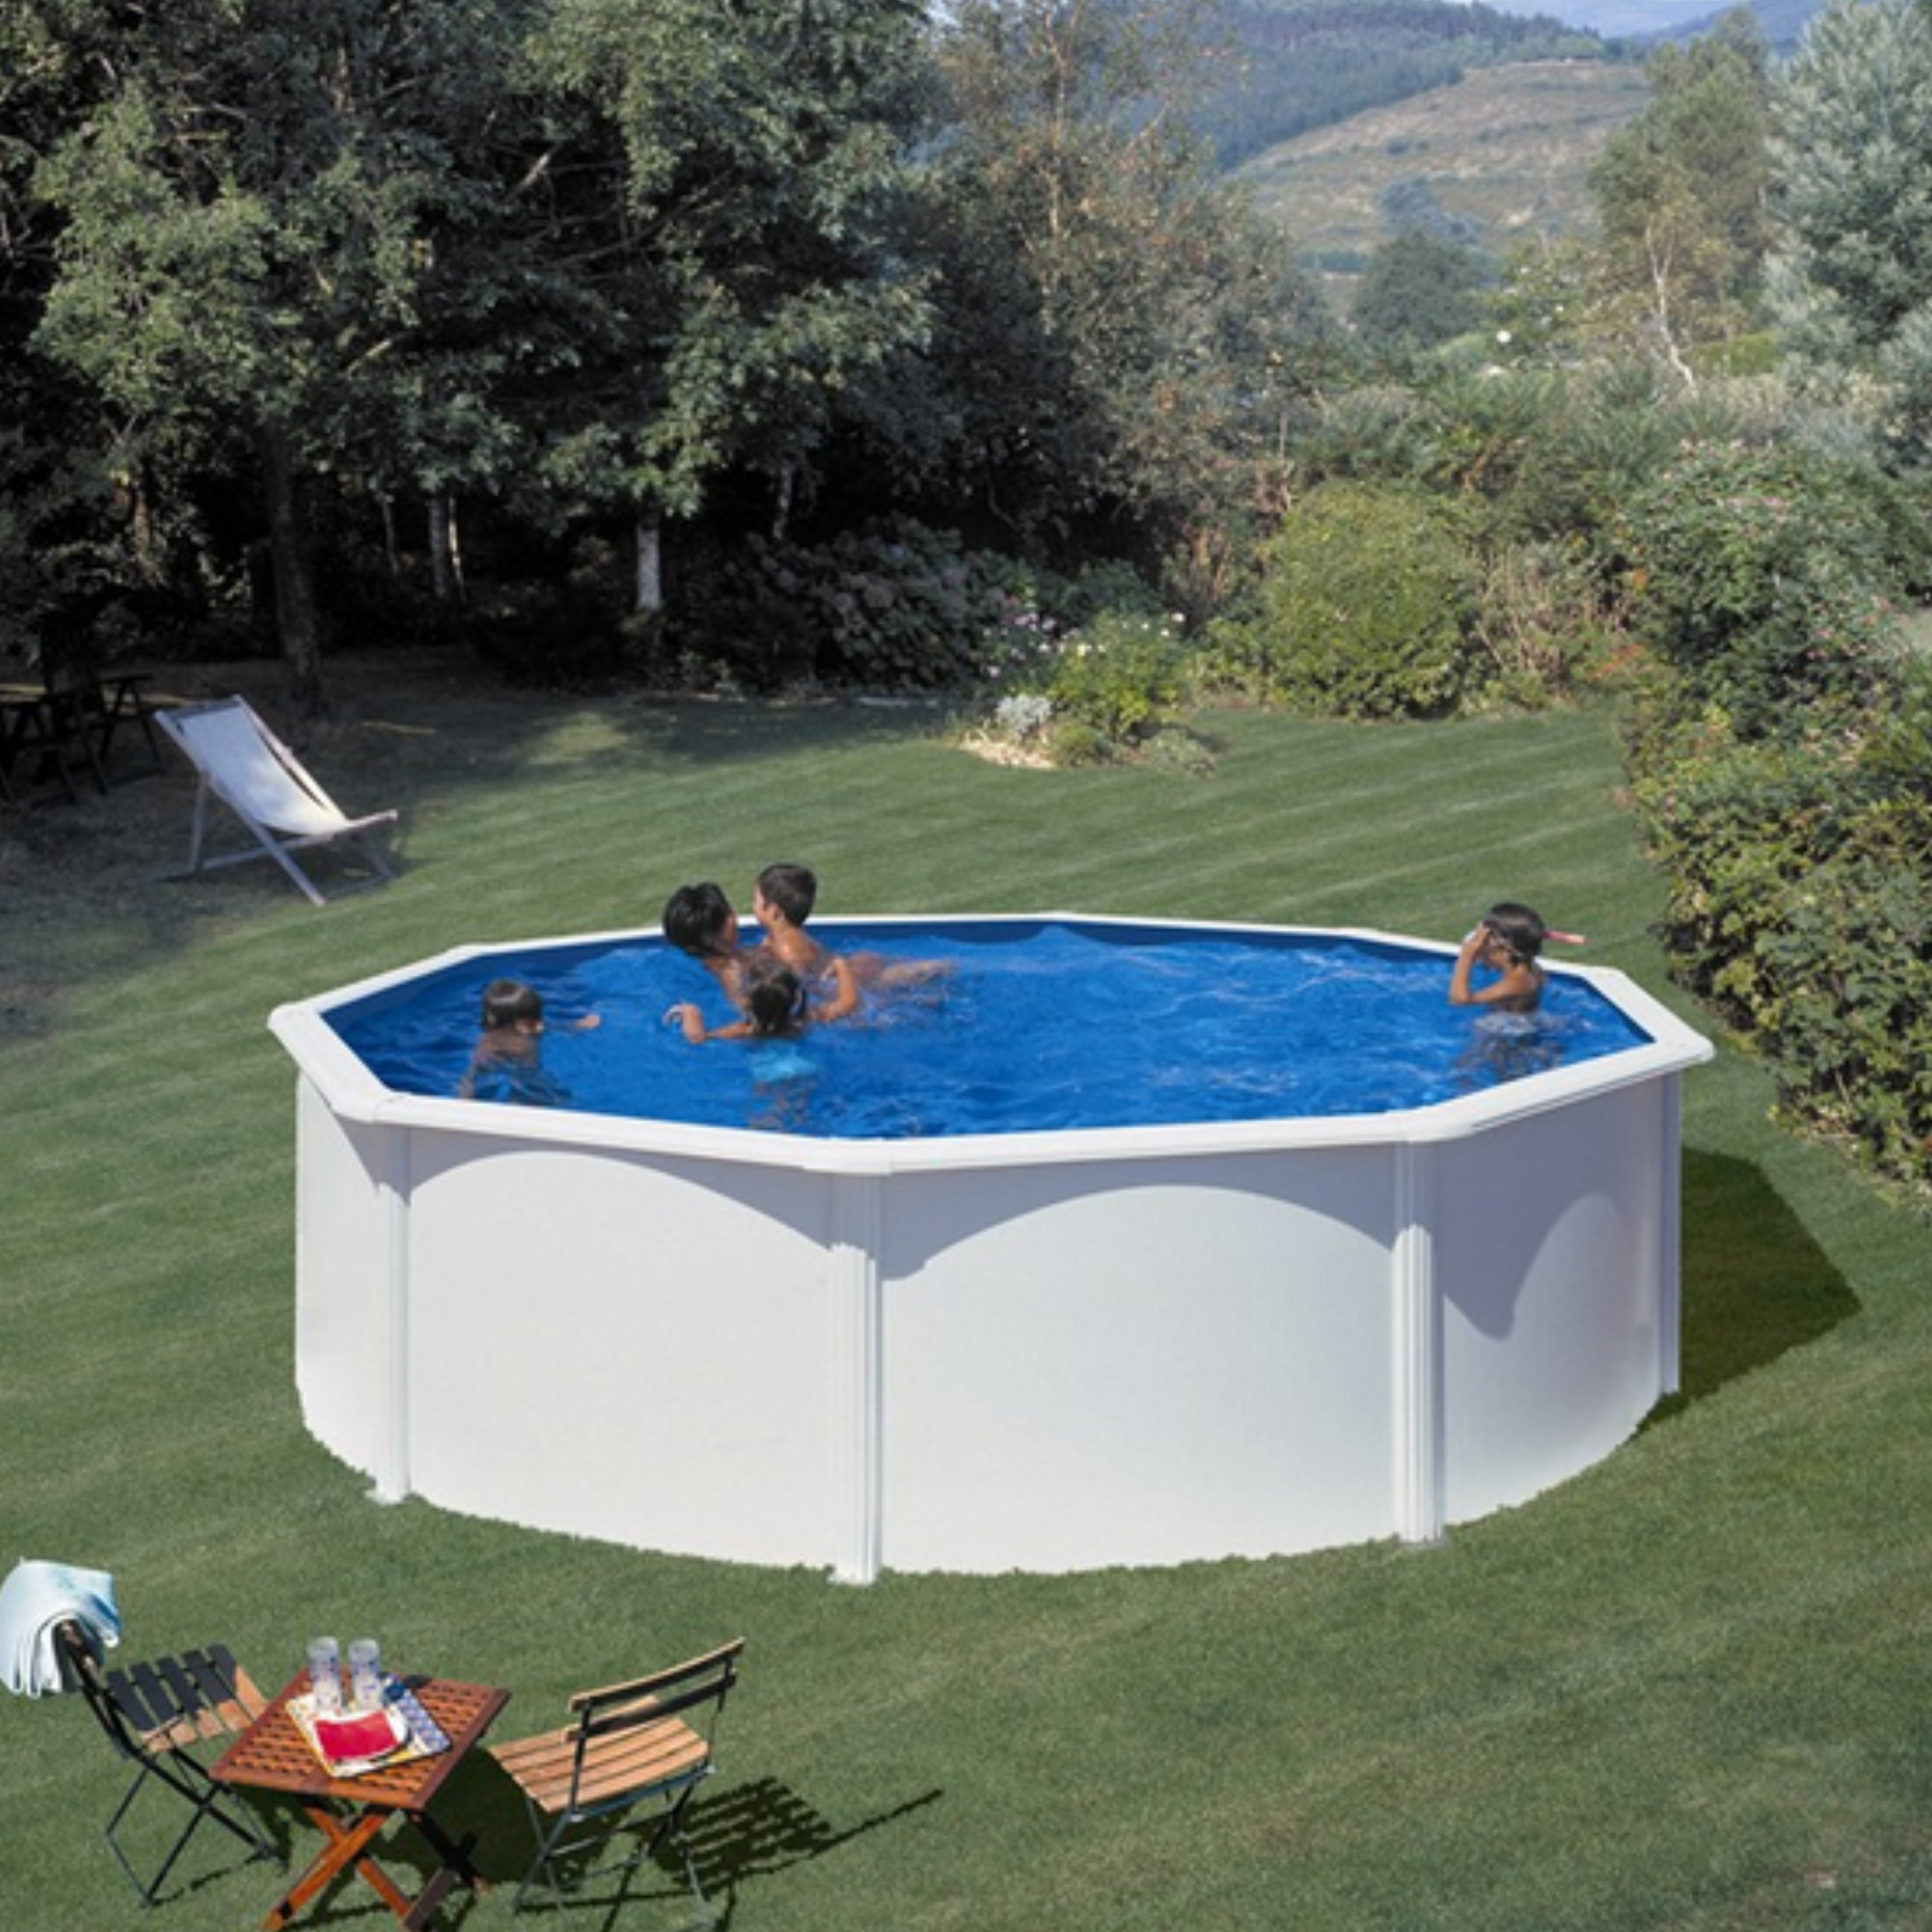 Rundformbeckenset stahloptik bali 460 x 120 cm pool for Poolfolie 460 x 120